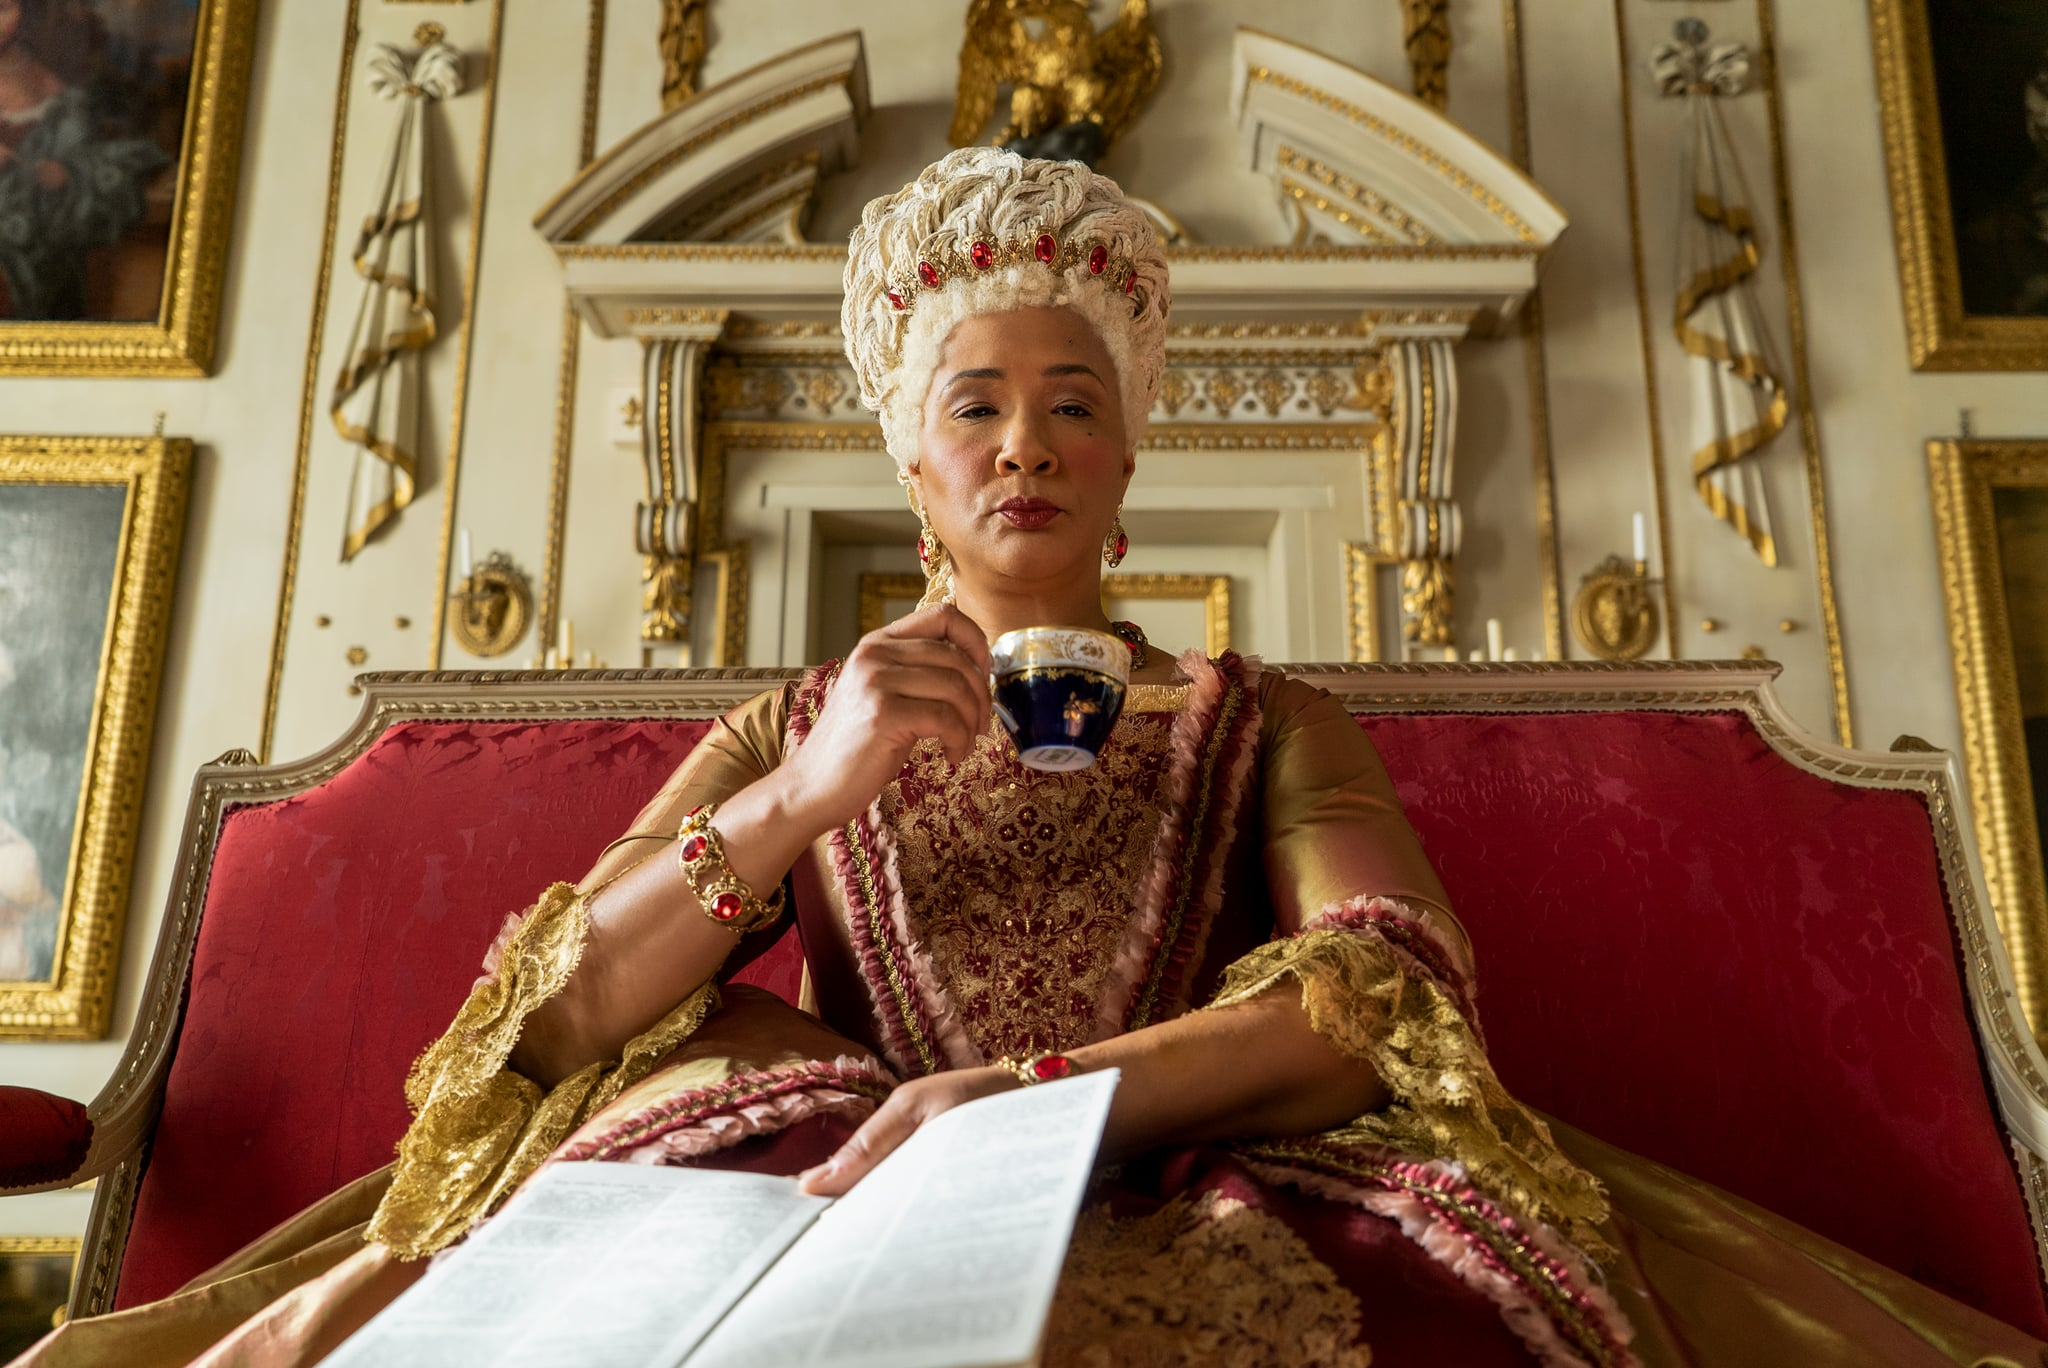 BRIDGERTON GOLDA ROSHEUVEL as QUEEN CHARLOTTE in episode 105 of BRIDGERTON Cr. LIAM DANIEL/NETFLIX  2020